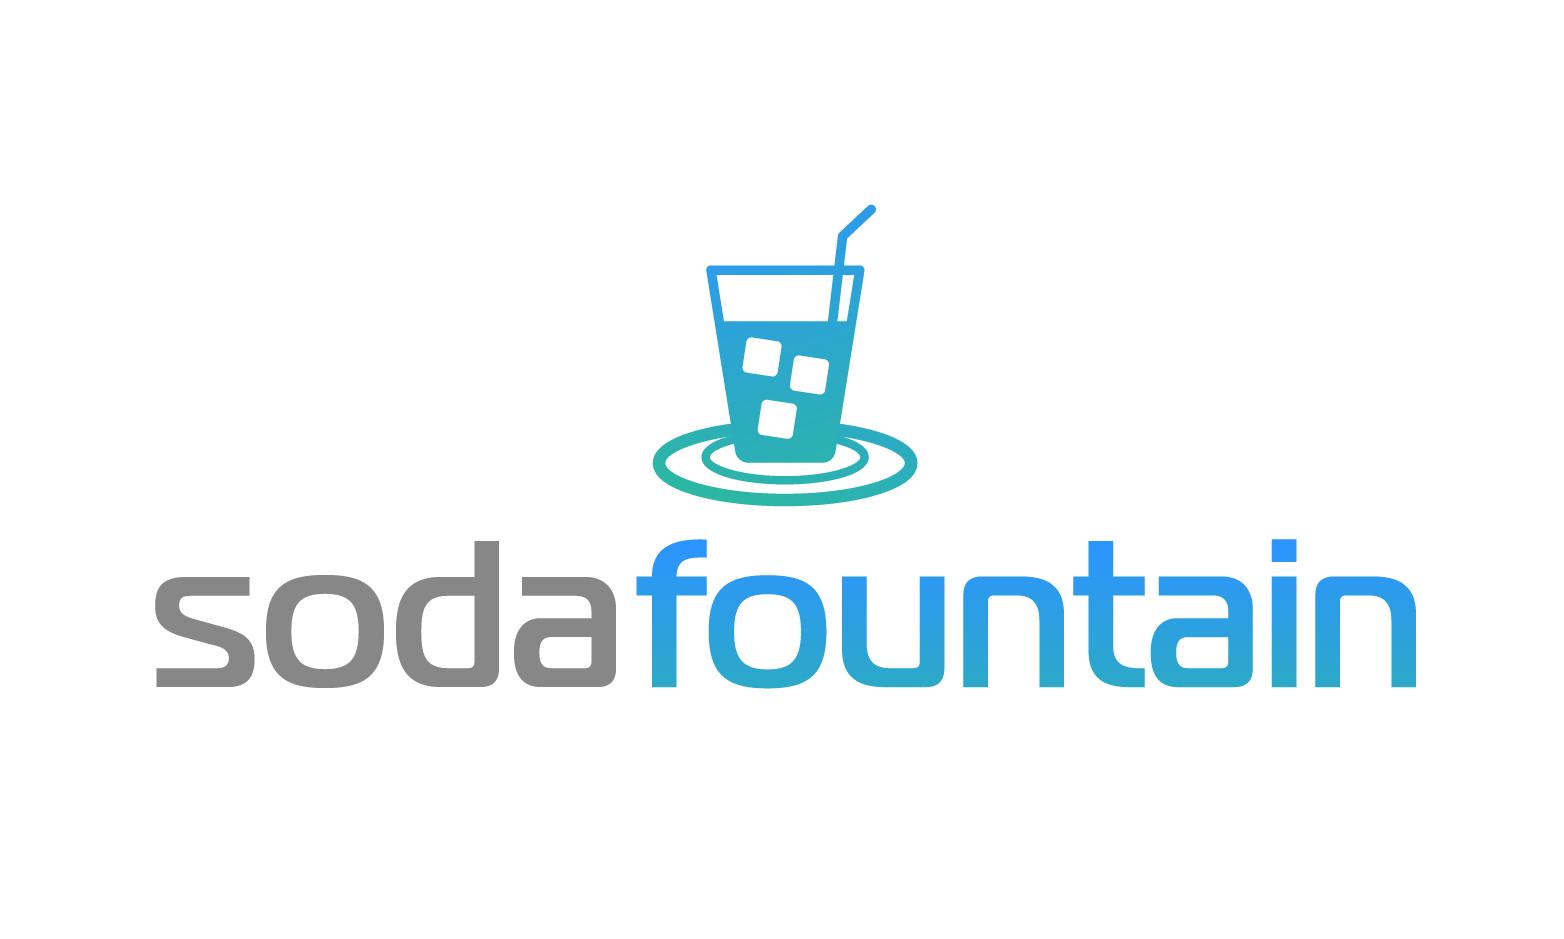 SodaFountain.com